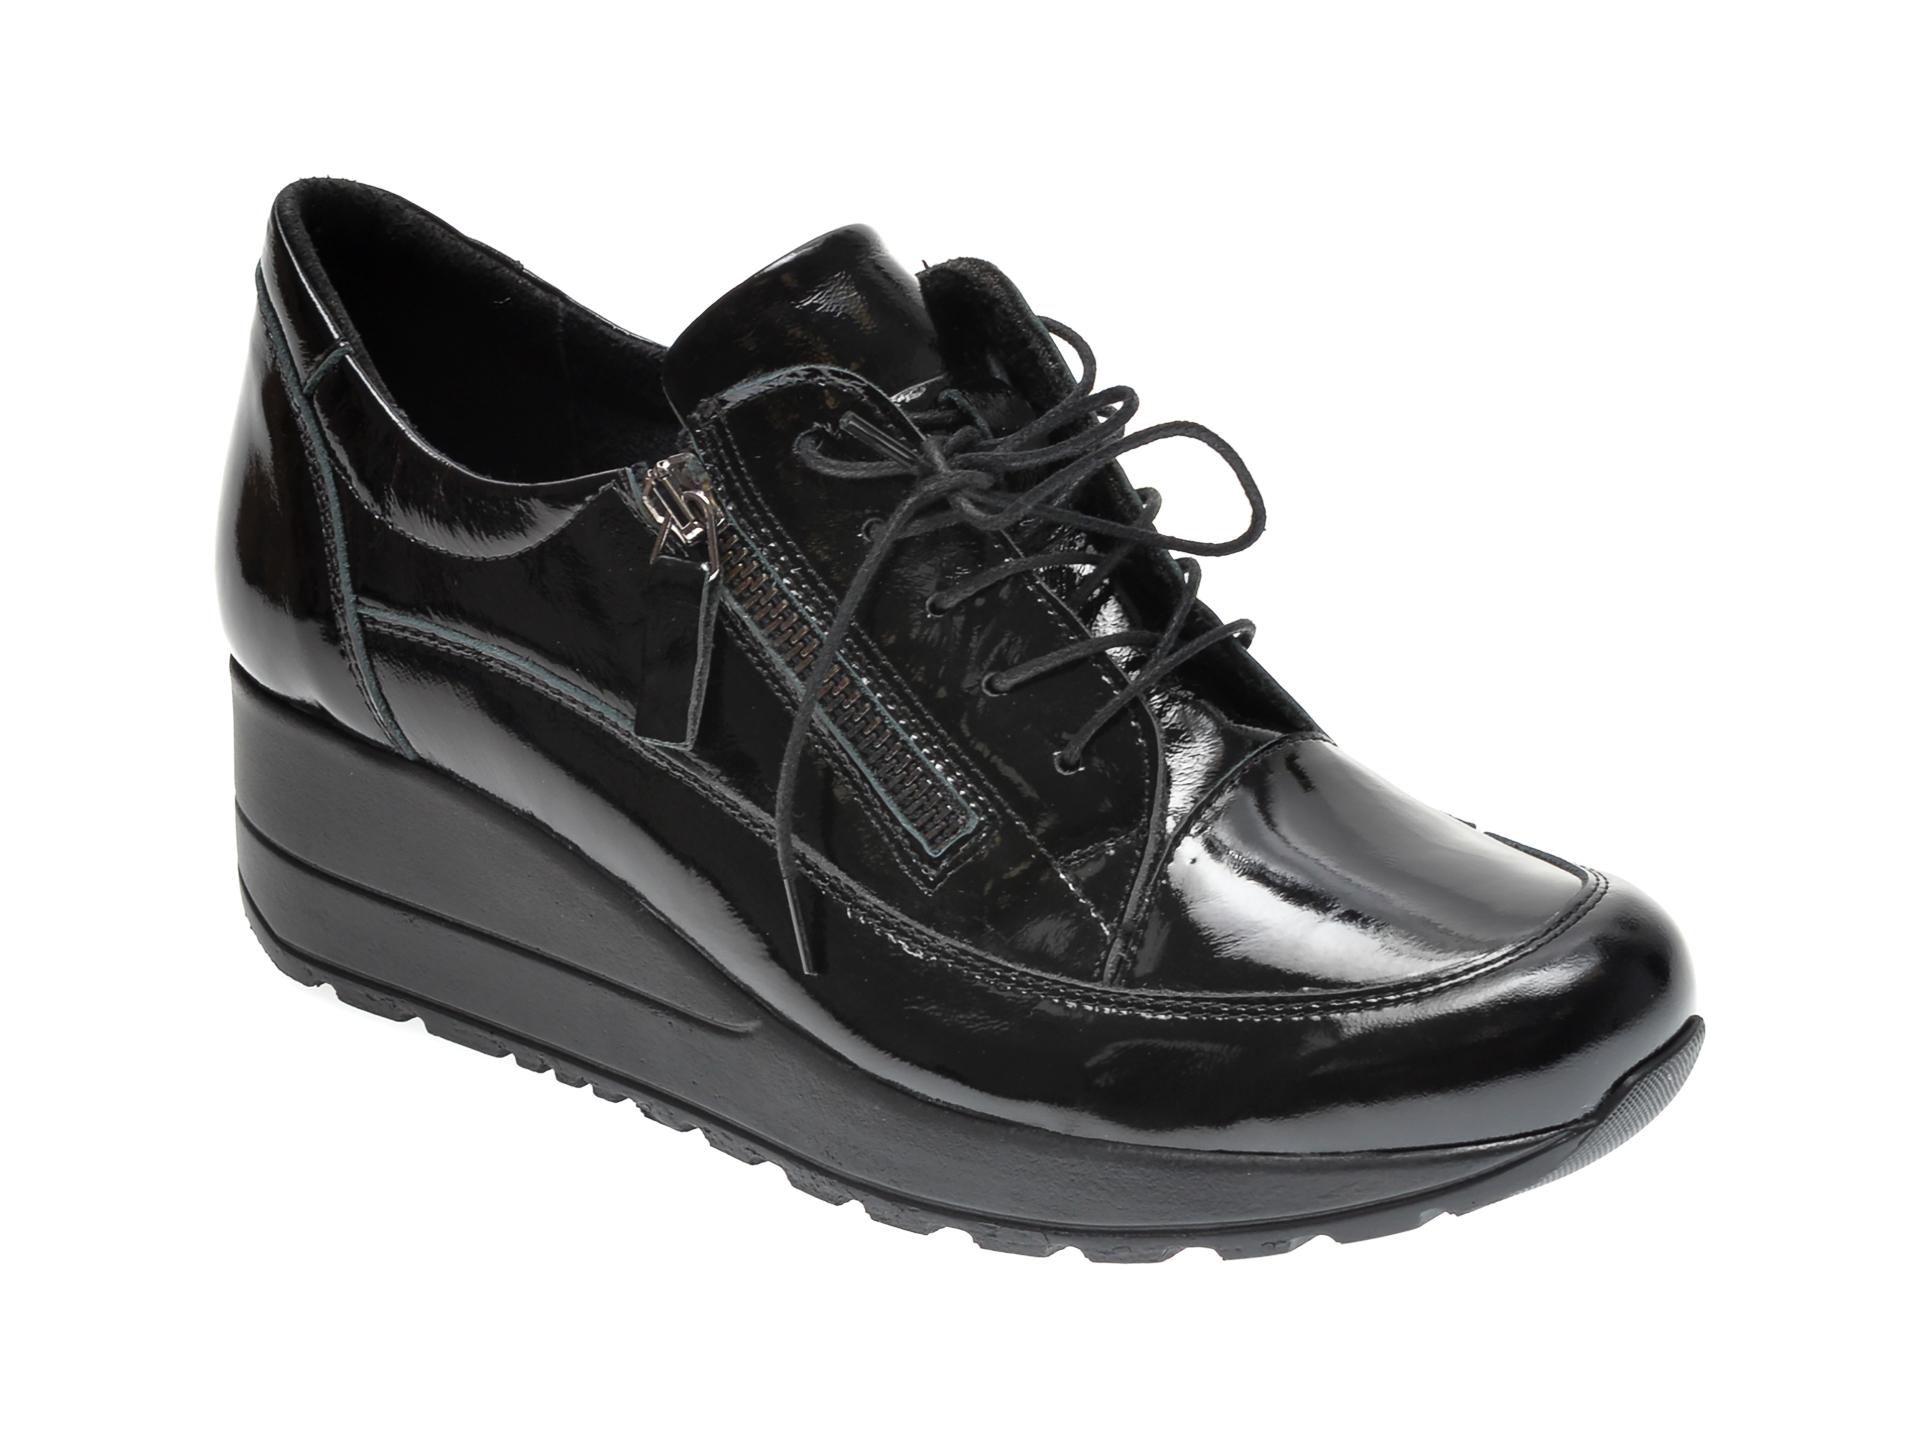 Pantofi ILOZ negri, 9217, din piele naturala lacuita imagine